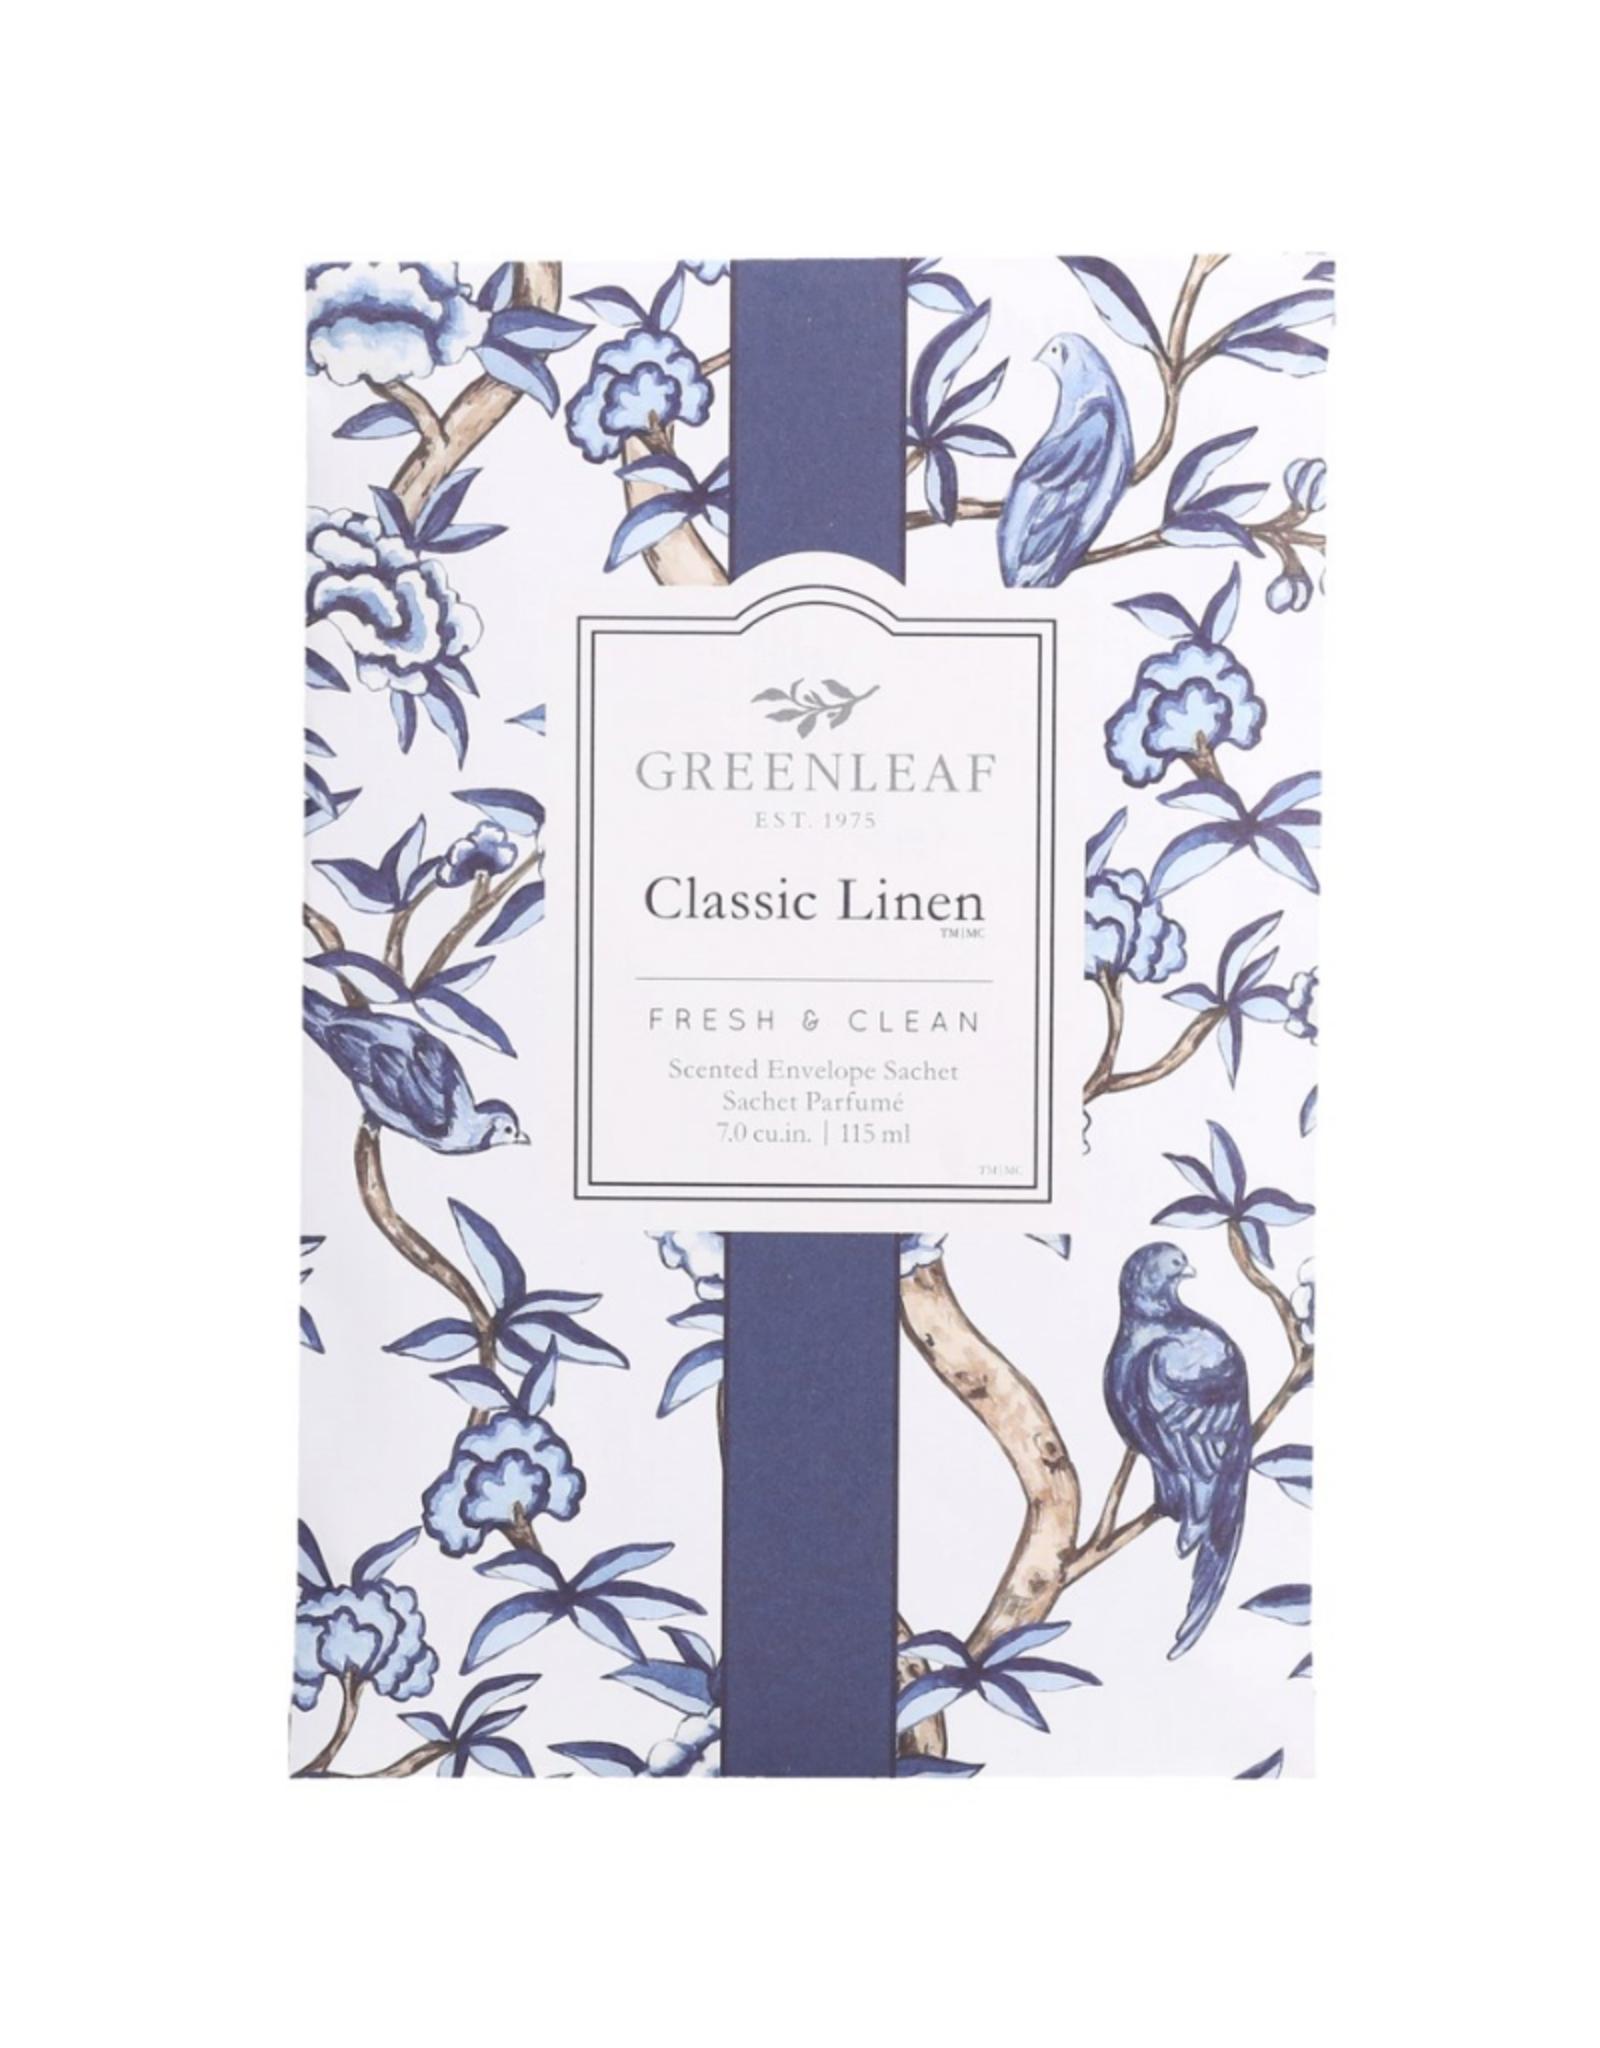 Greenleaf Sachet parfumé 115ml